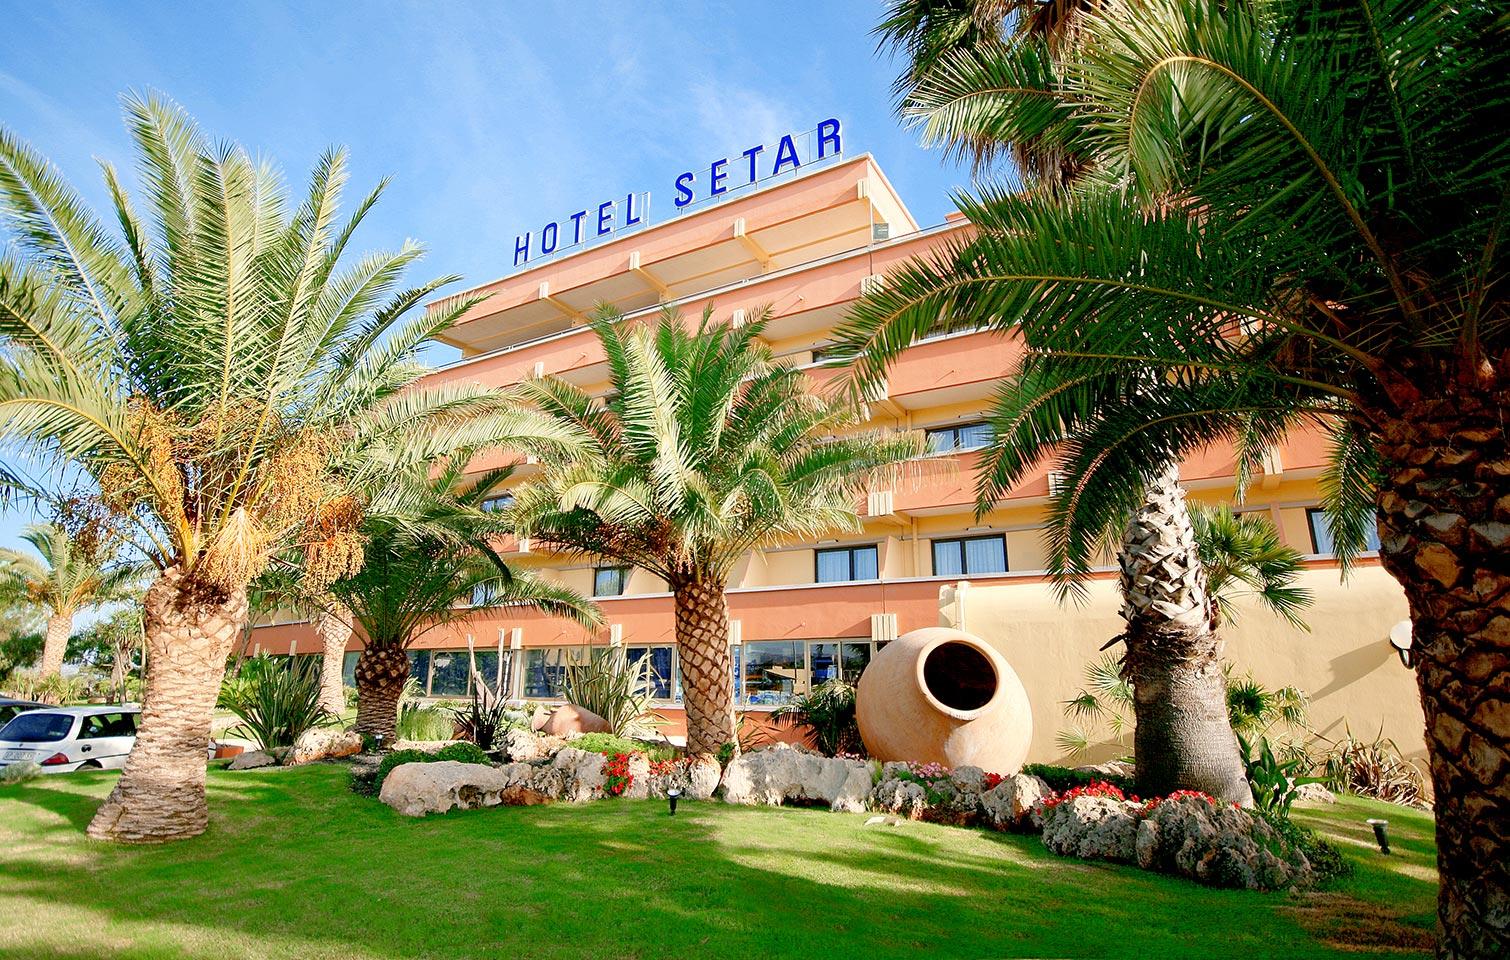 Hotel setar quartu sant 39 elena for Hotel sardegna cagliari